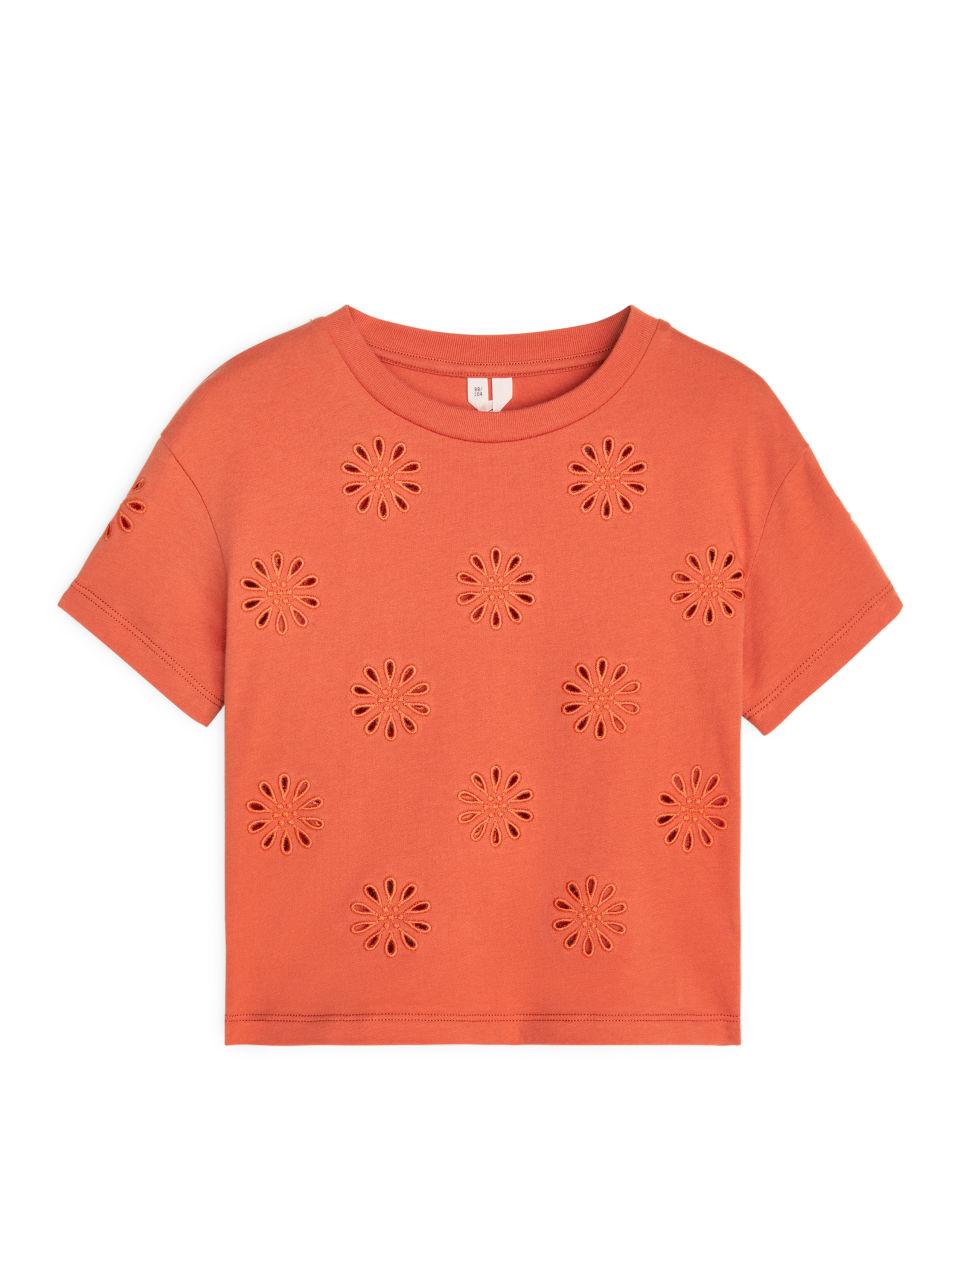 Embroidered T-Shirt - Orange